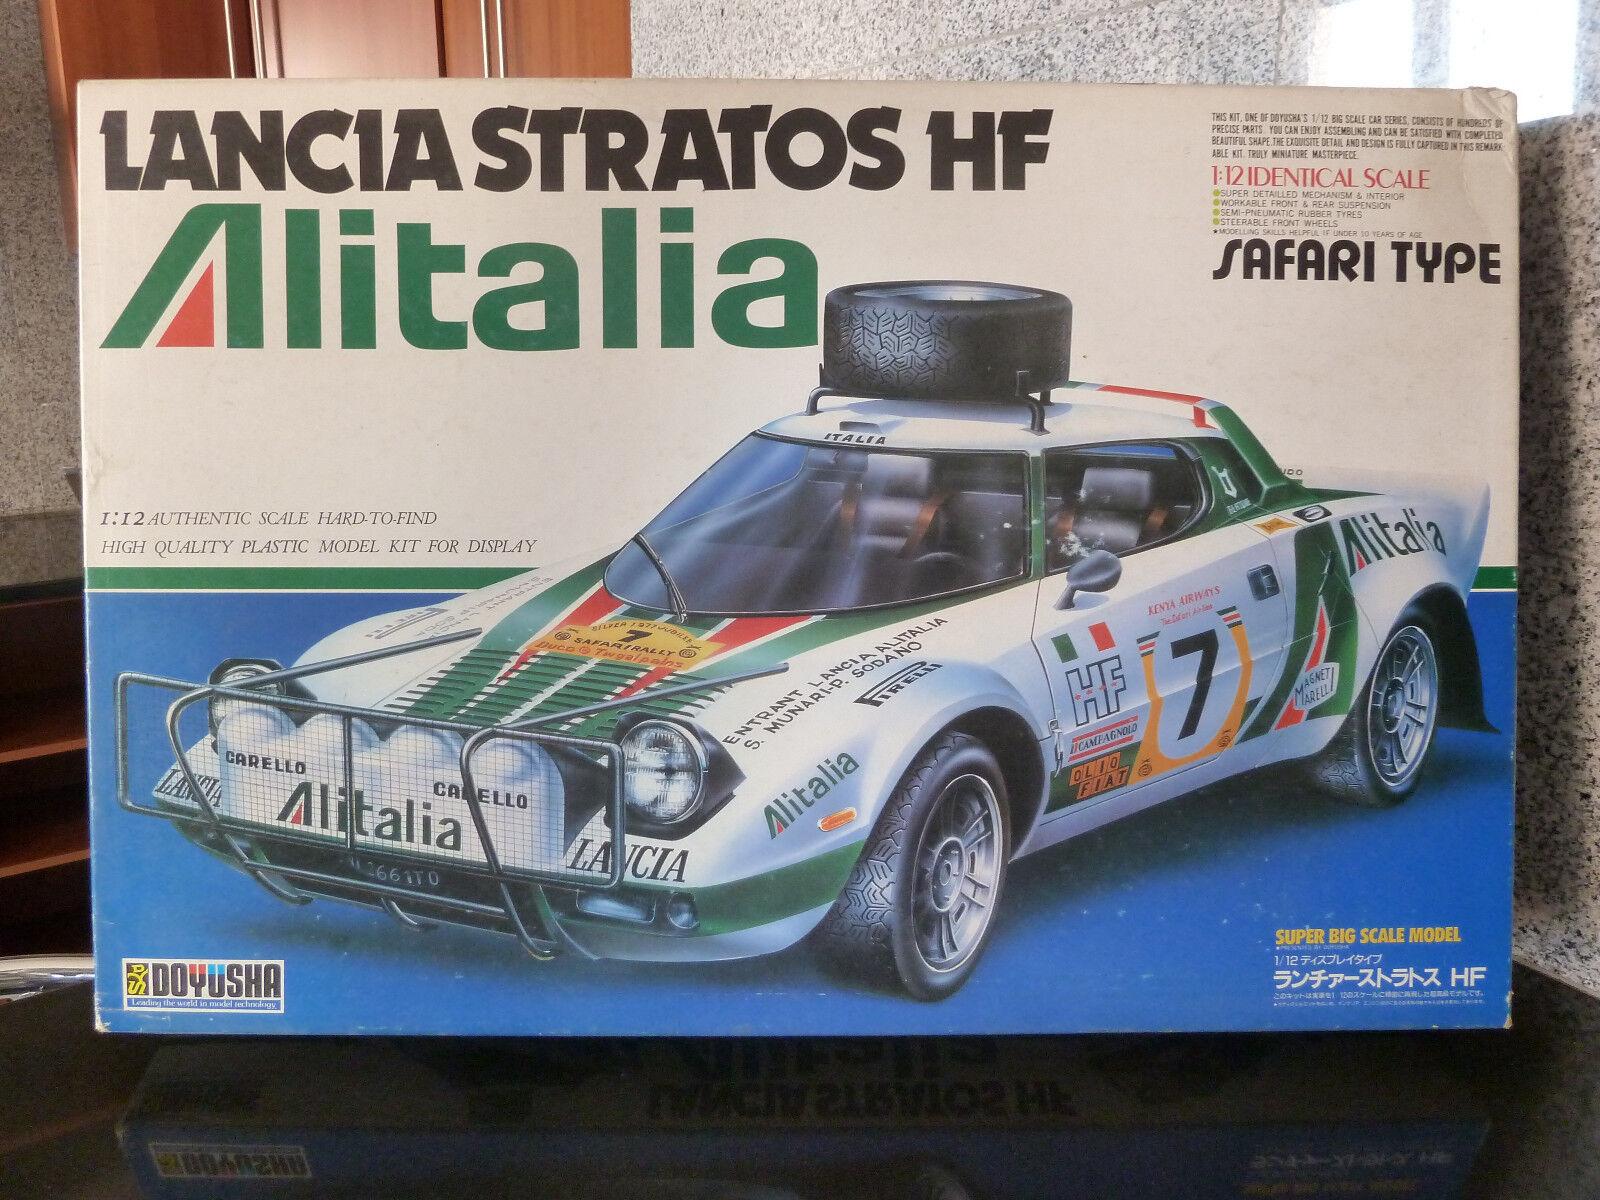 1 12 Doyusha, Lancia Stratos HF, Alitalia, Rally Safari